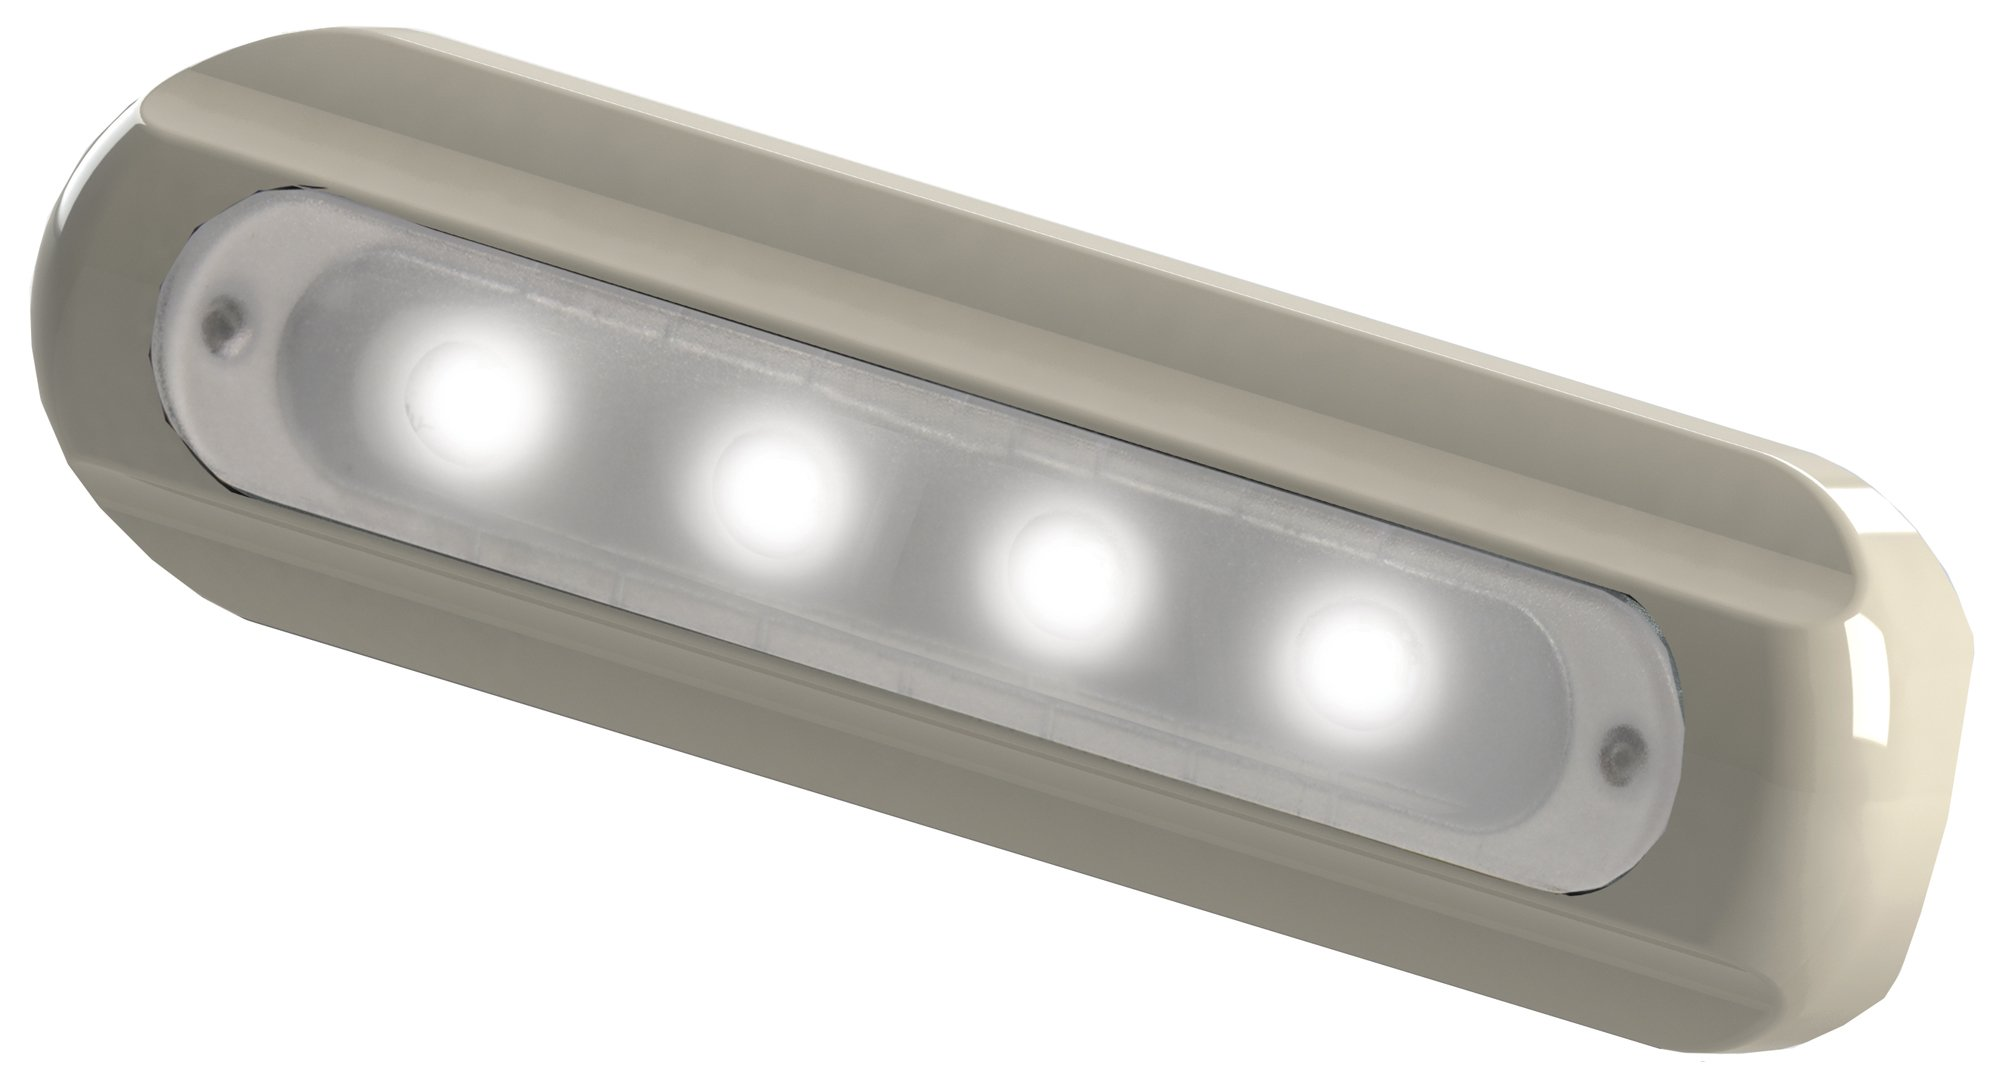 Taco Metals 4 LED Deck Light Flat Mount White Housing 4 LED Deck Light,